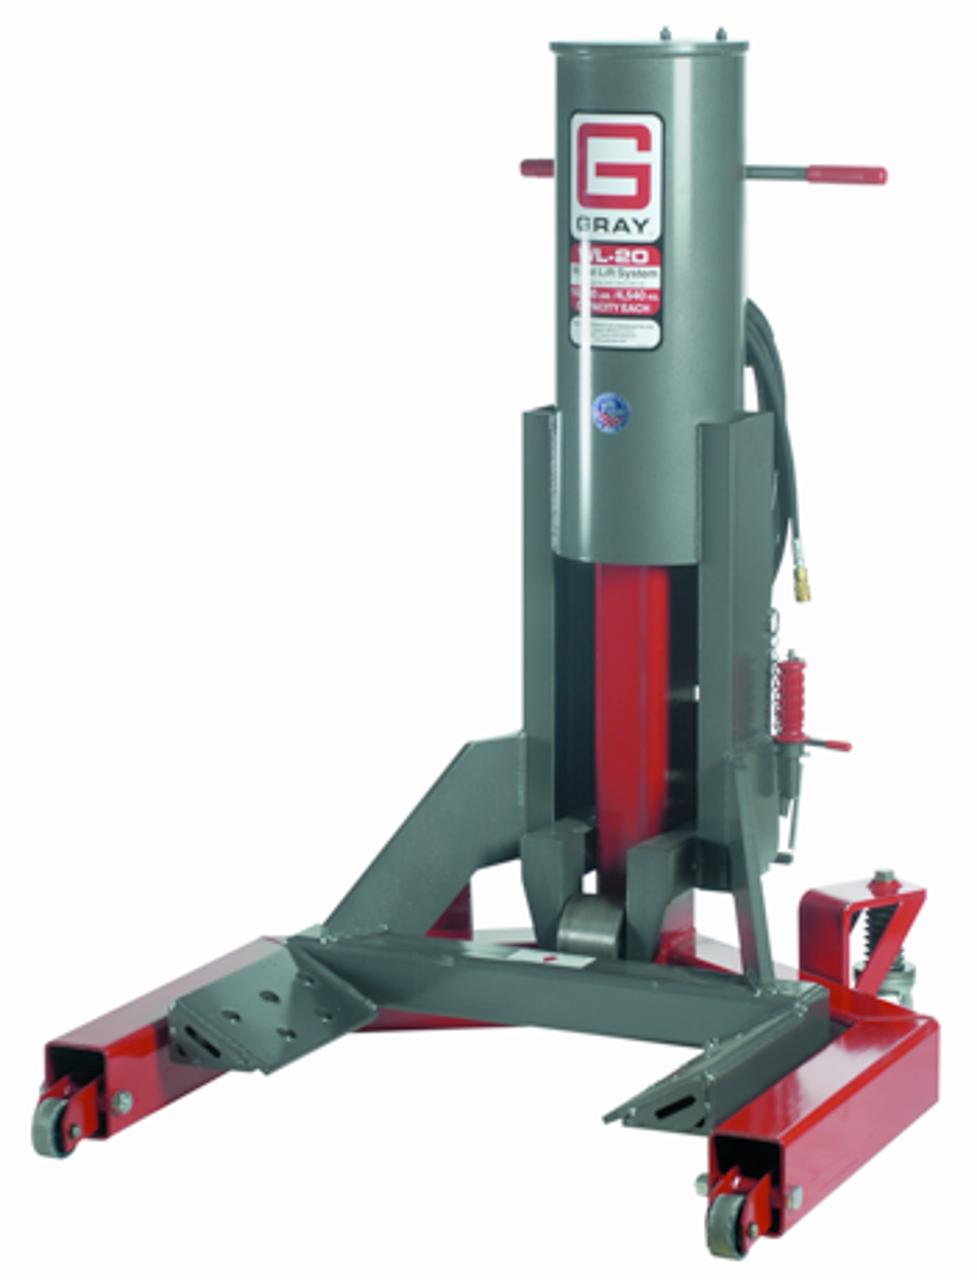 Gray WL-20 10 Ton Wheel Lift System  (US MADE) FREE SHIPPING